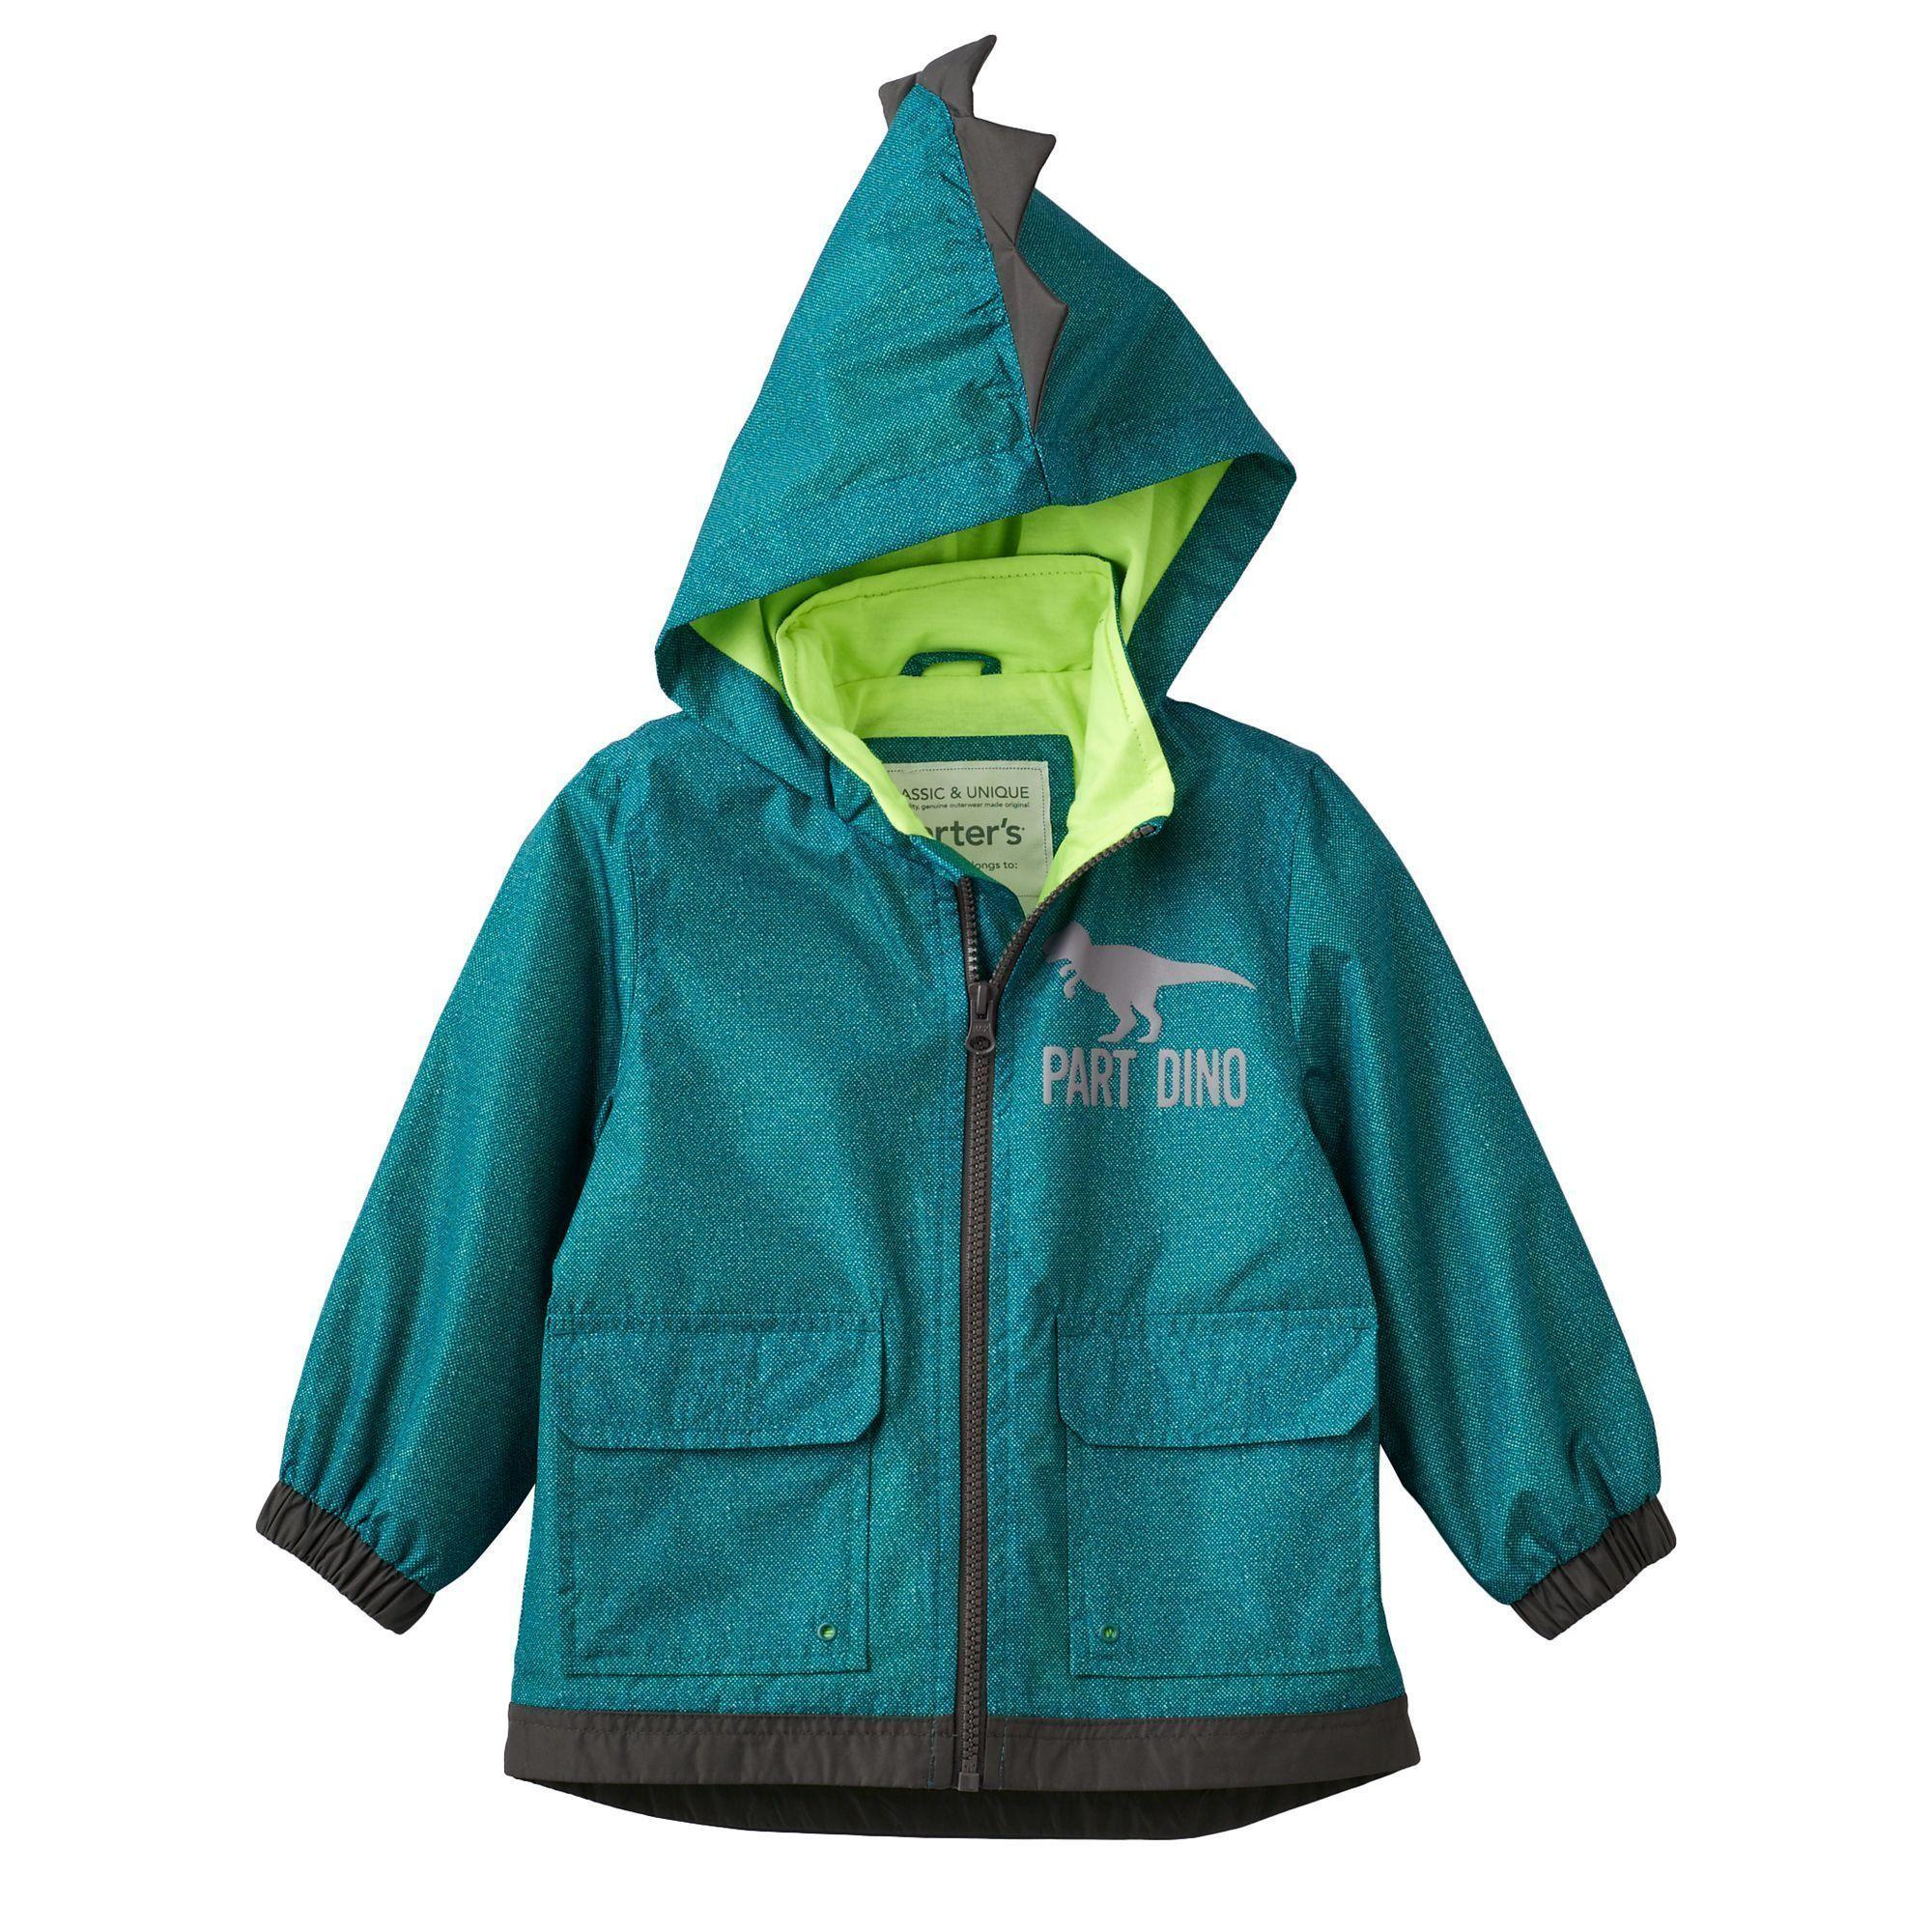 073fe6815e71 Baby Boy Carter s Lightweight Green Dino Rain Jacket